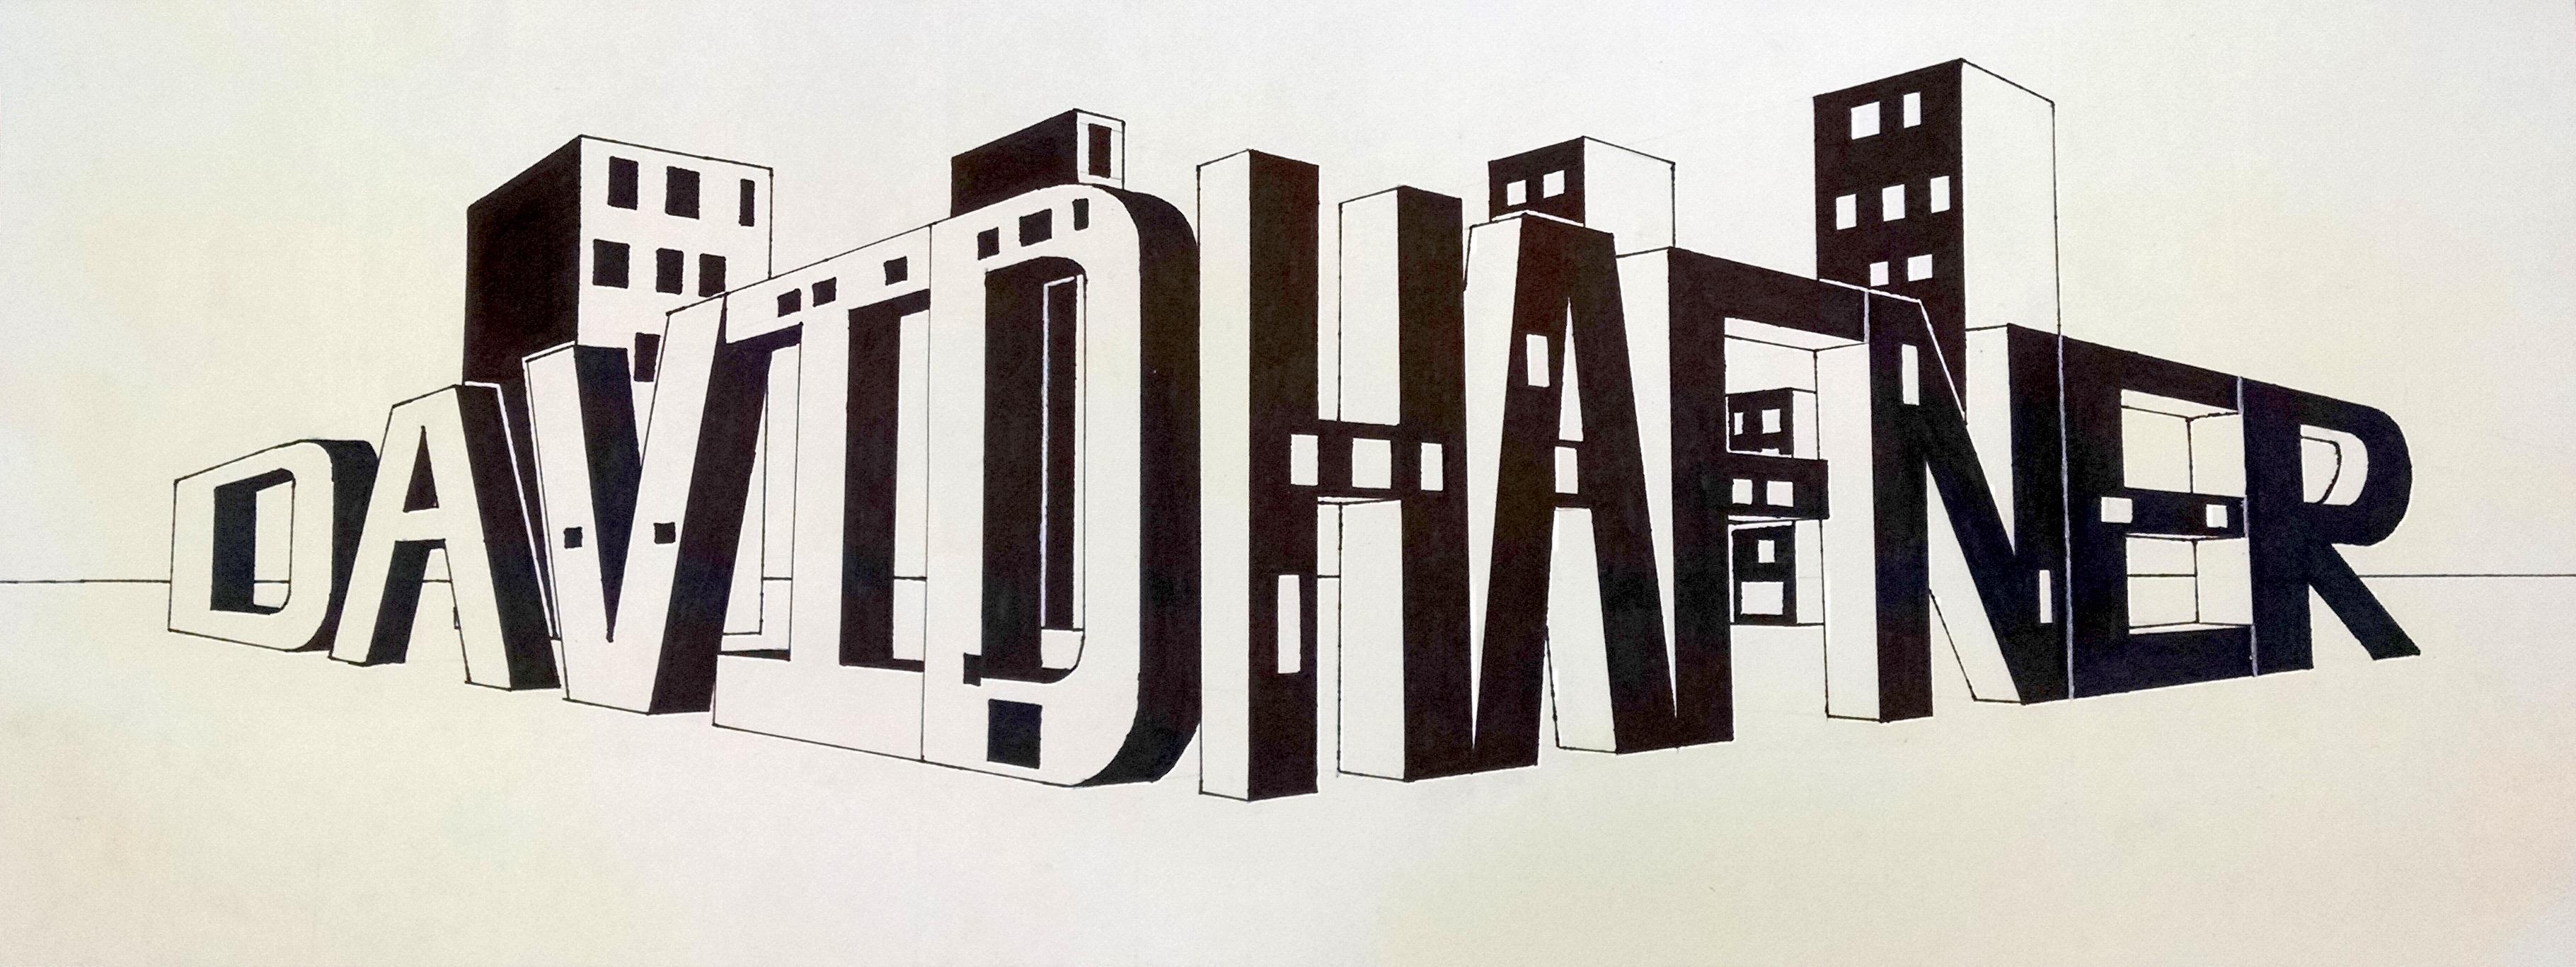 2 Point Perspective Name Drawing Davidhafnergcva